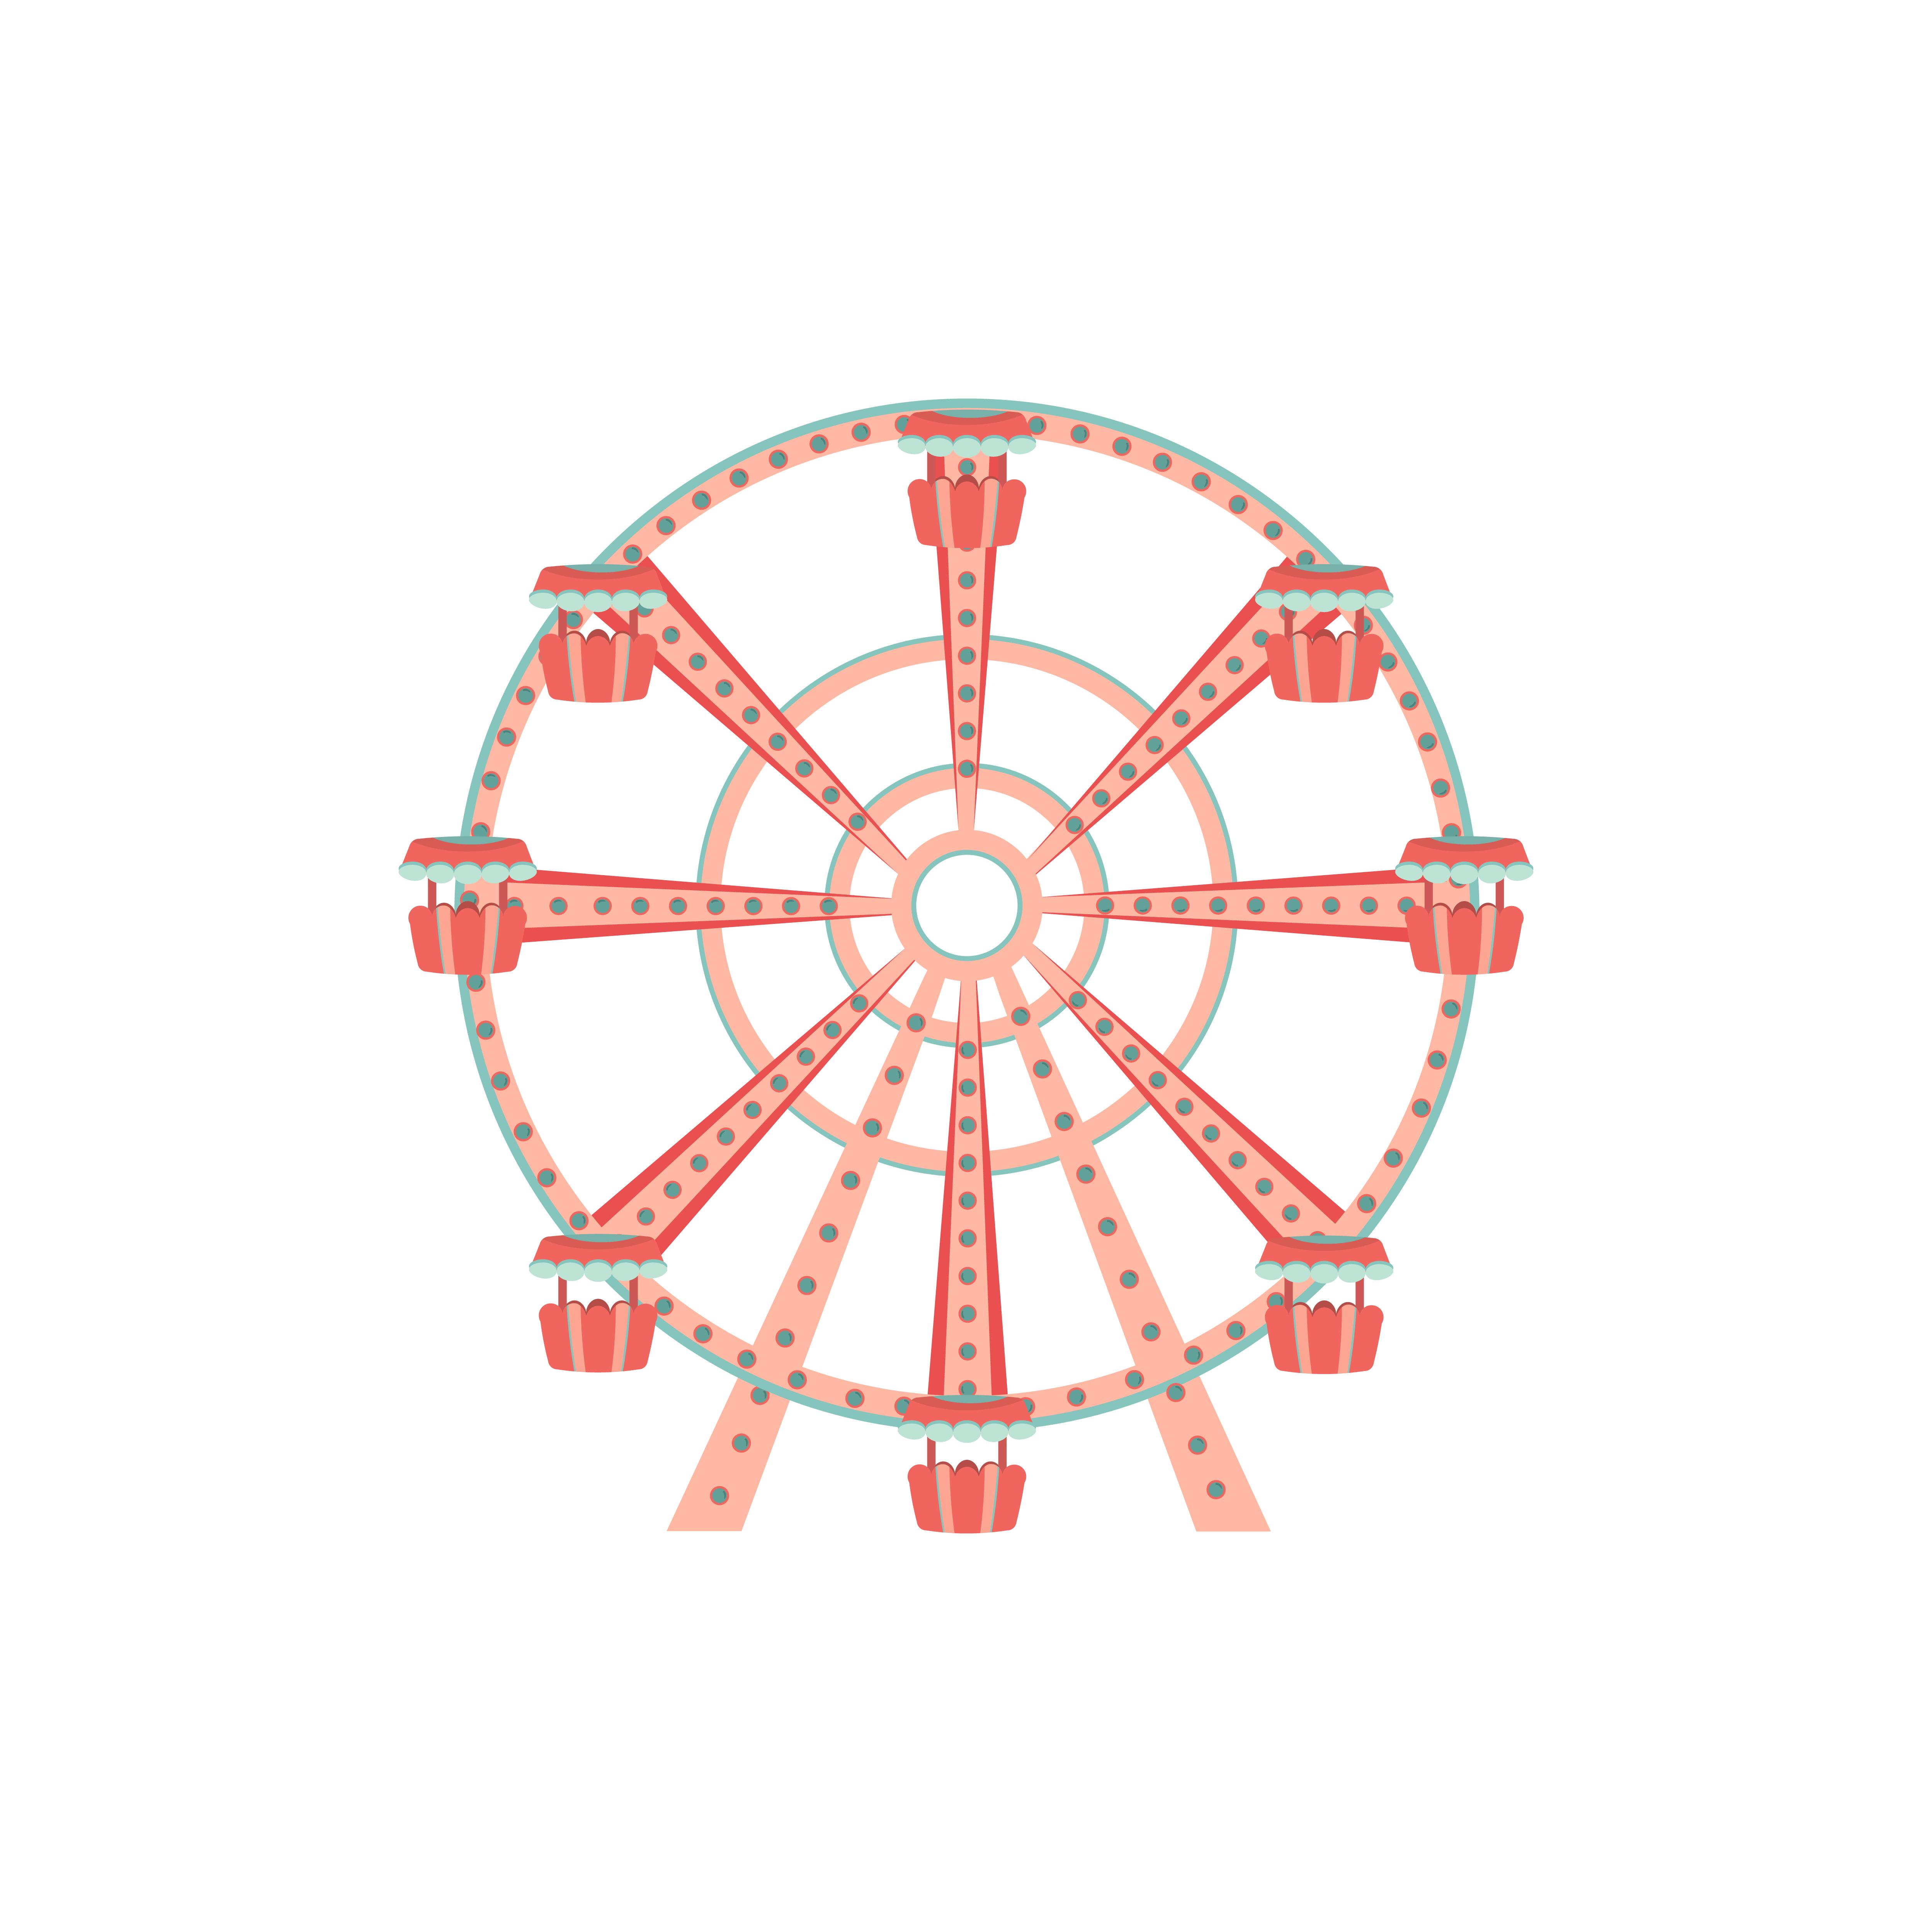 Cartoon Ferris Wheel Icon Amusement Park Ride Download Free Vectors Clipart Graphics Vector Art